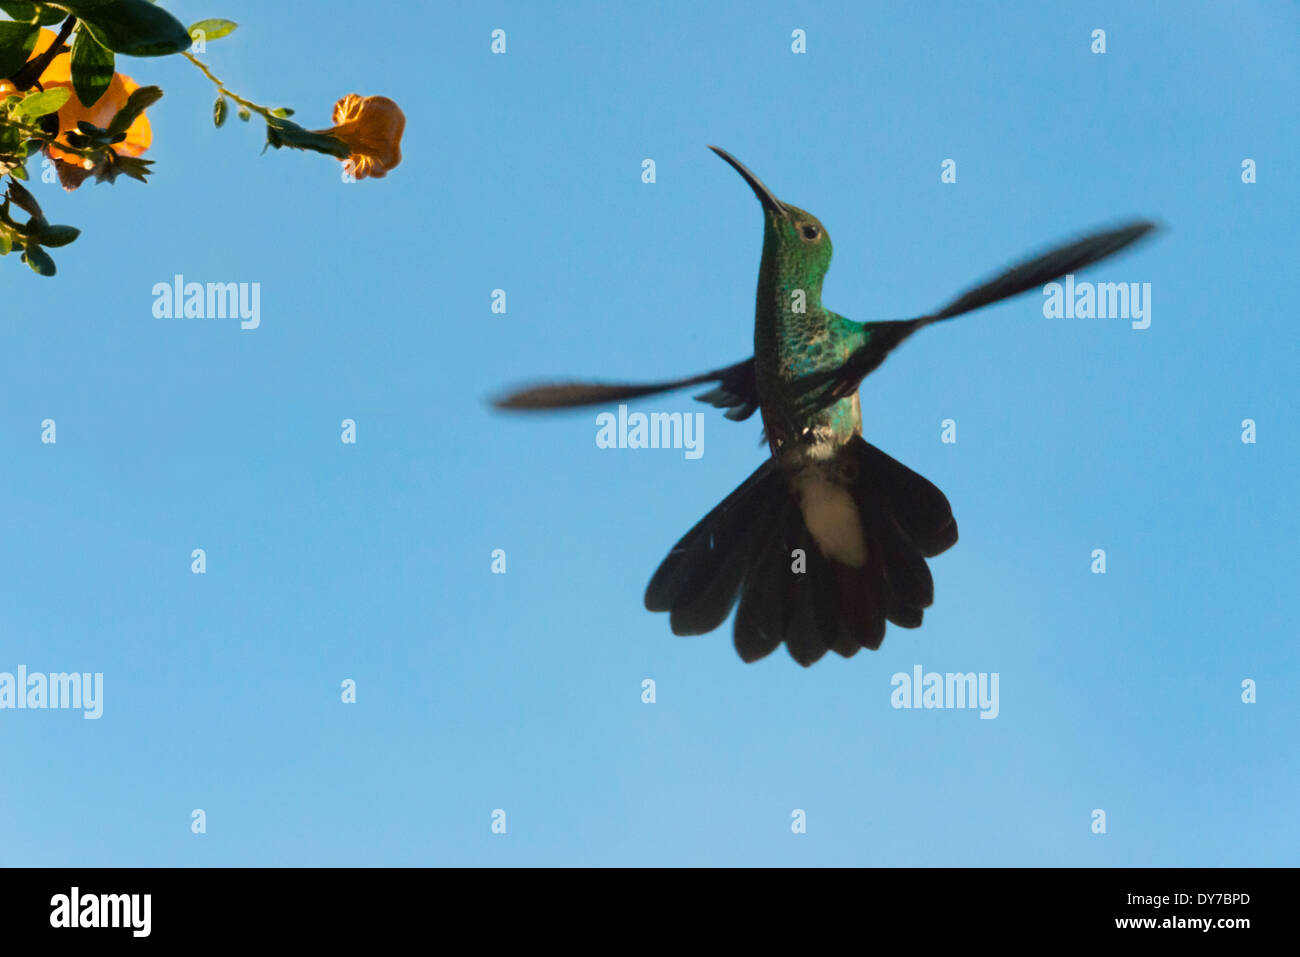 Hummingbird, Venezuela - Stock Image